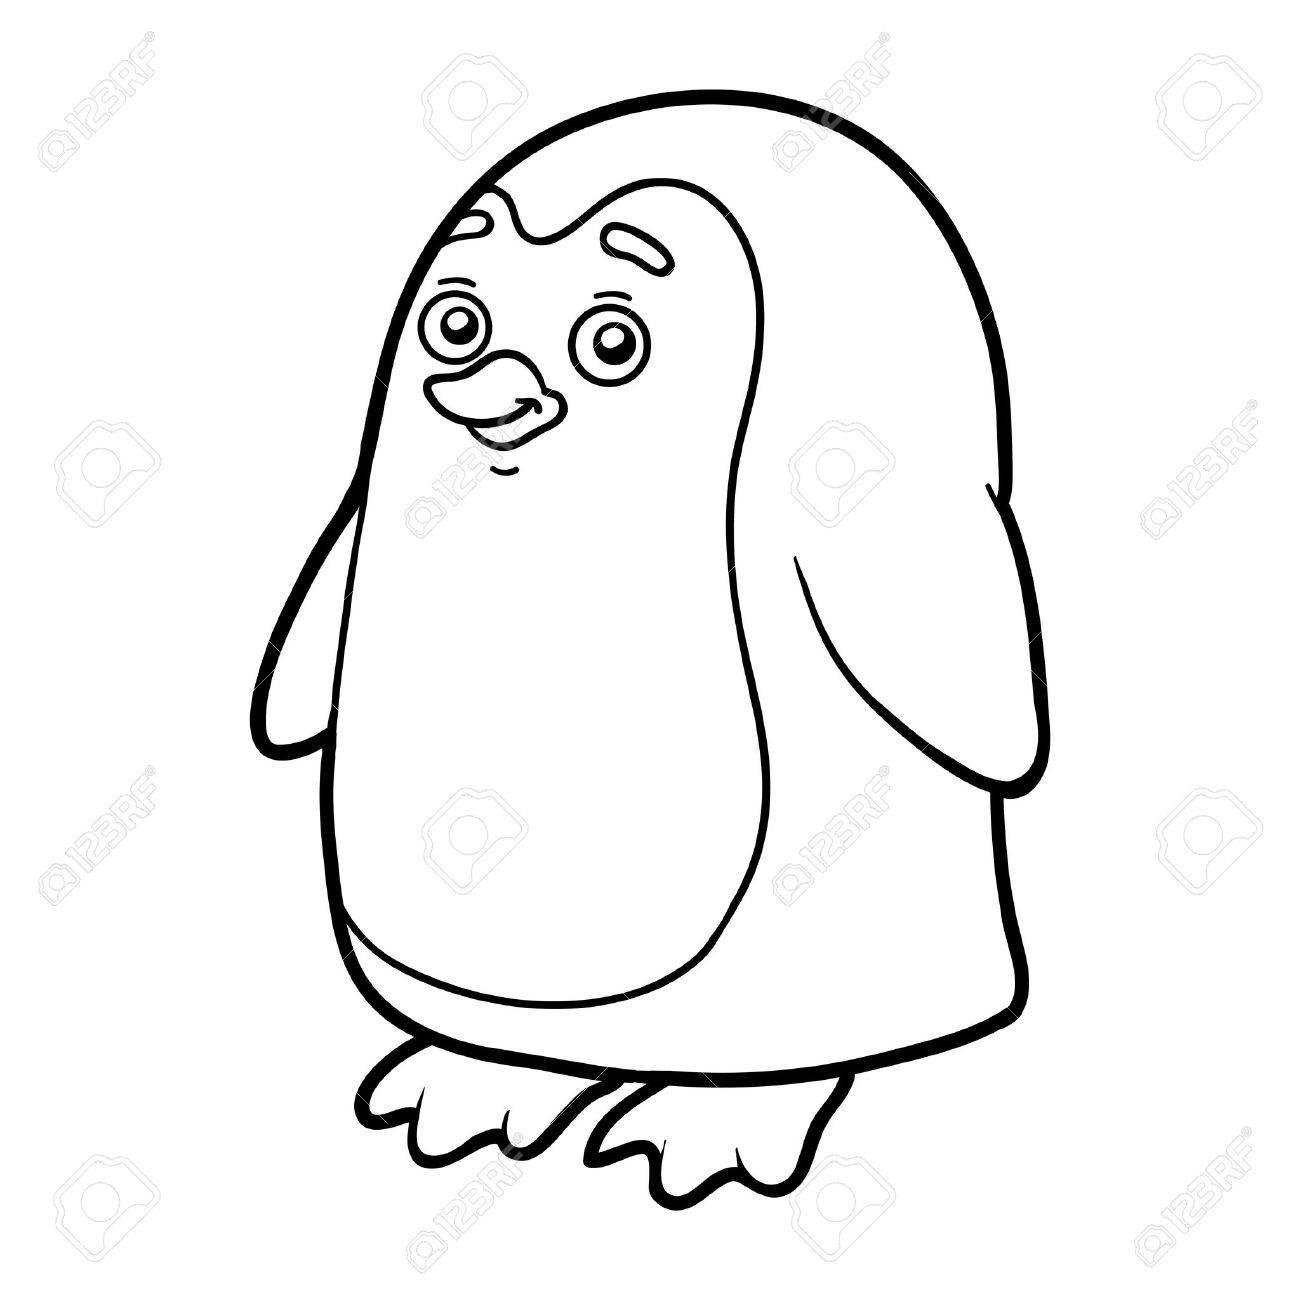 Asombroso Pingüinos Para Colorear Para Niños Ideas - Dibujos Para ...